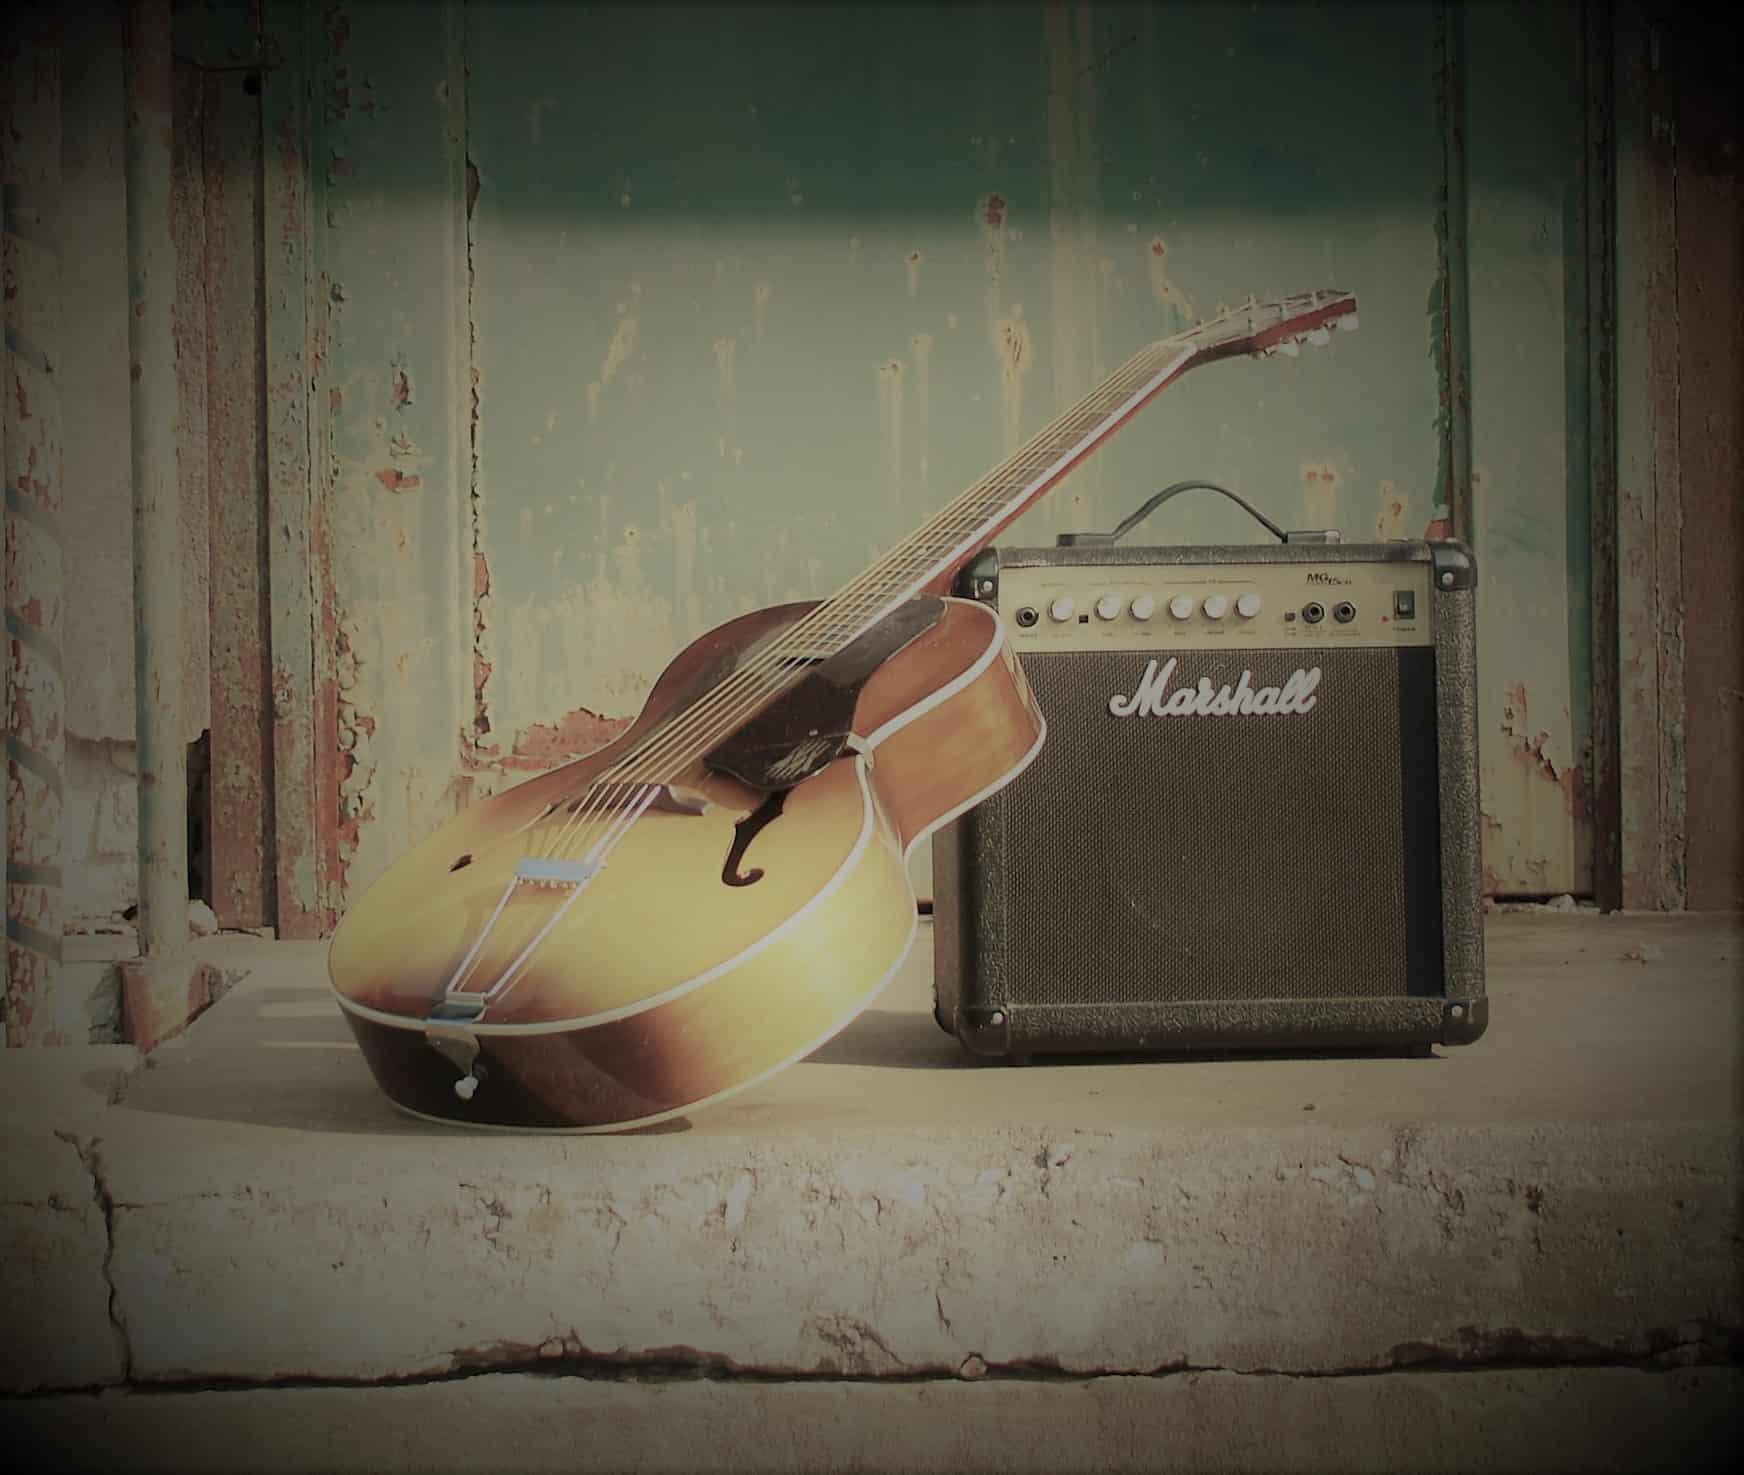 Al Bloch guitar & amp